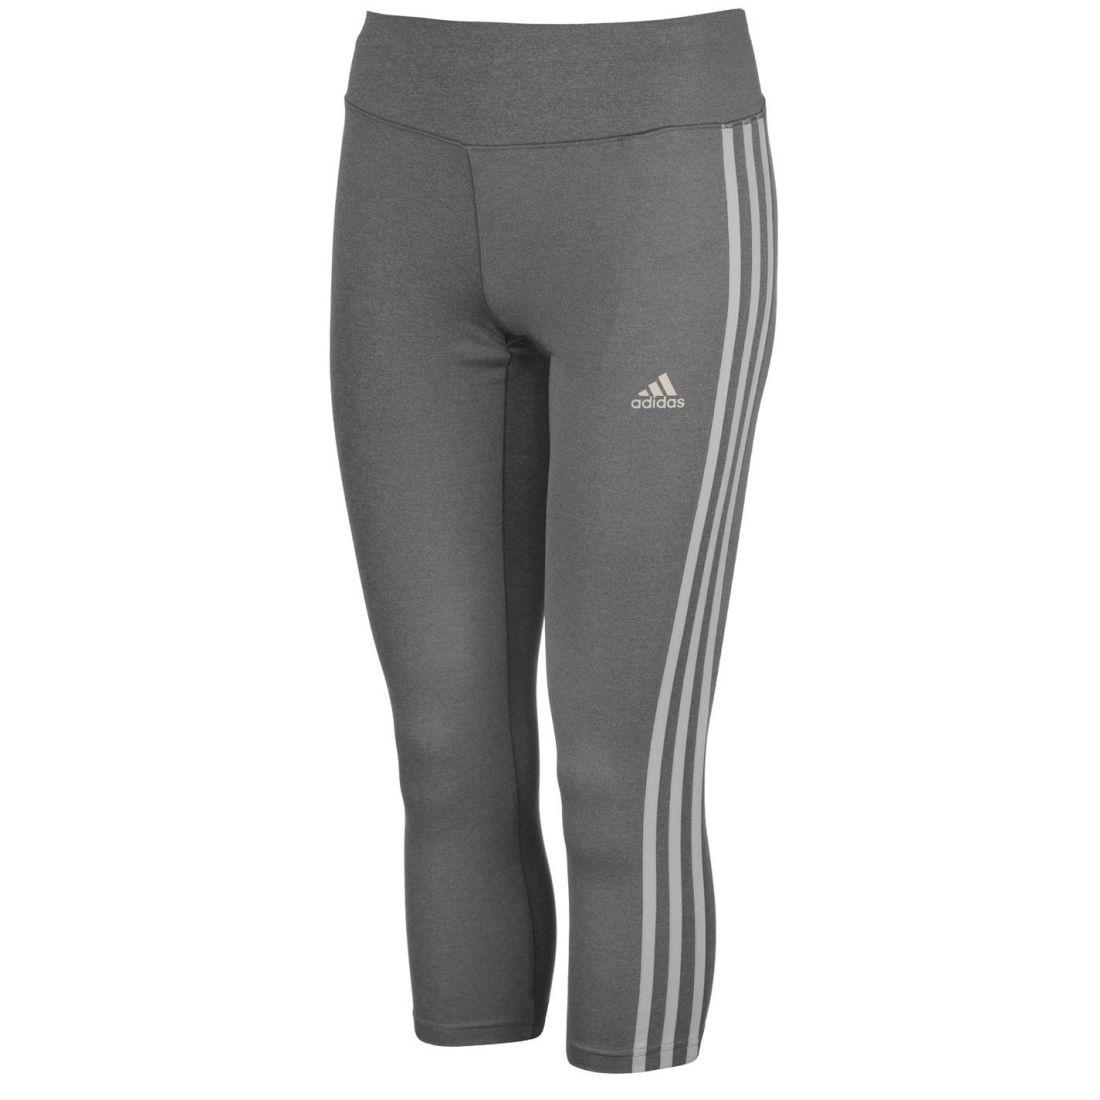 adidas Womens 3 Stripe Three Quarter Tights Capris Pants Trousers Bottoms 2f36d54882